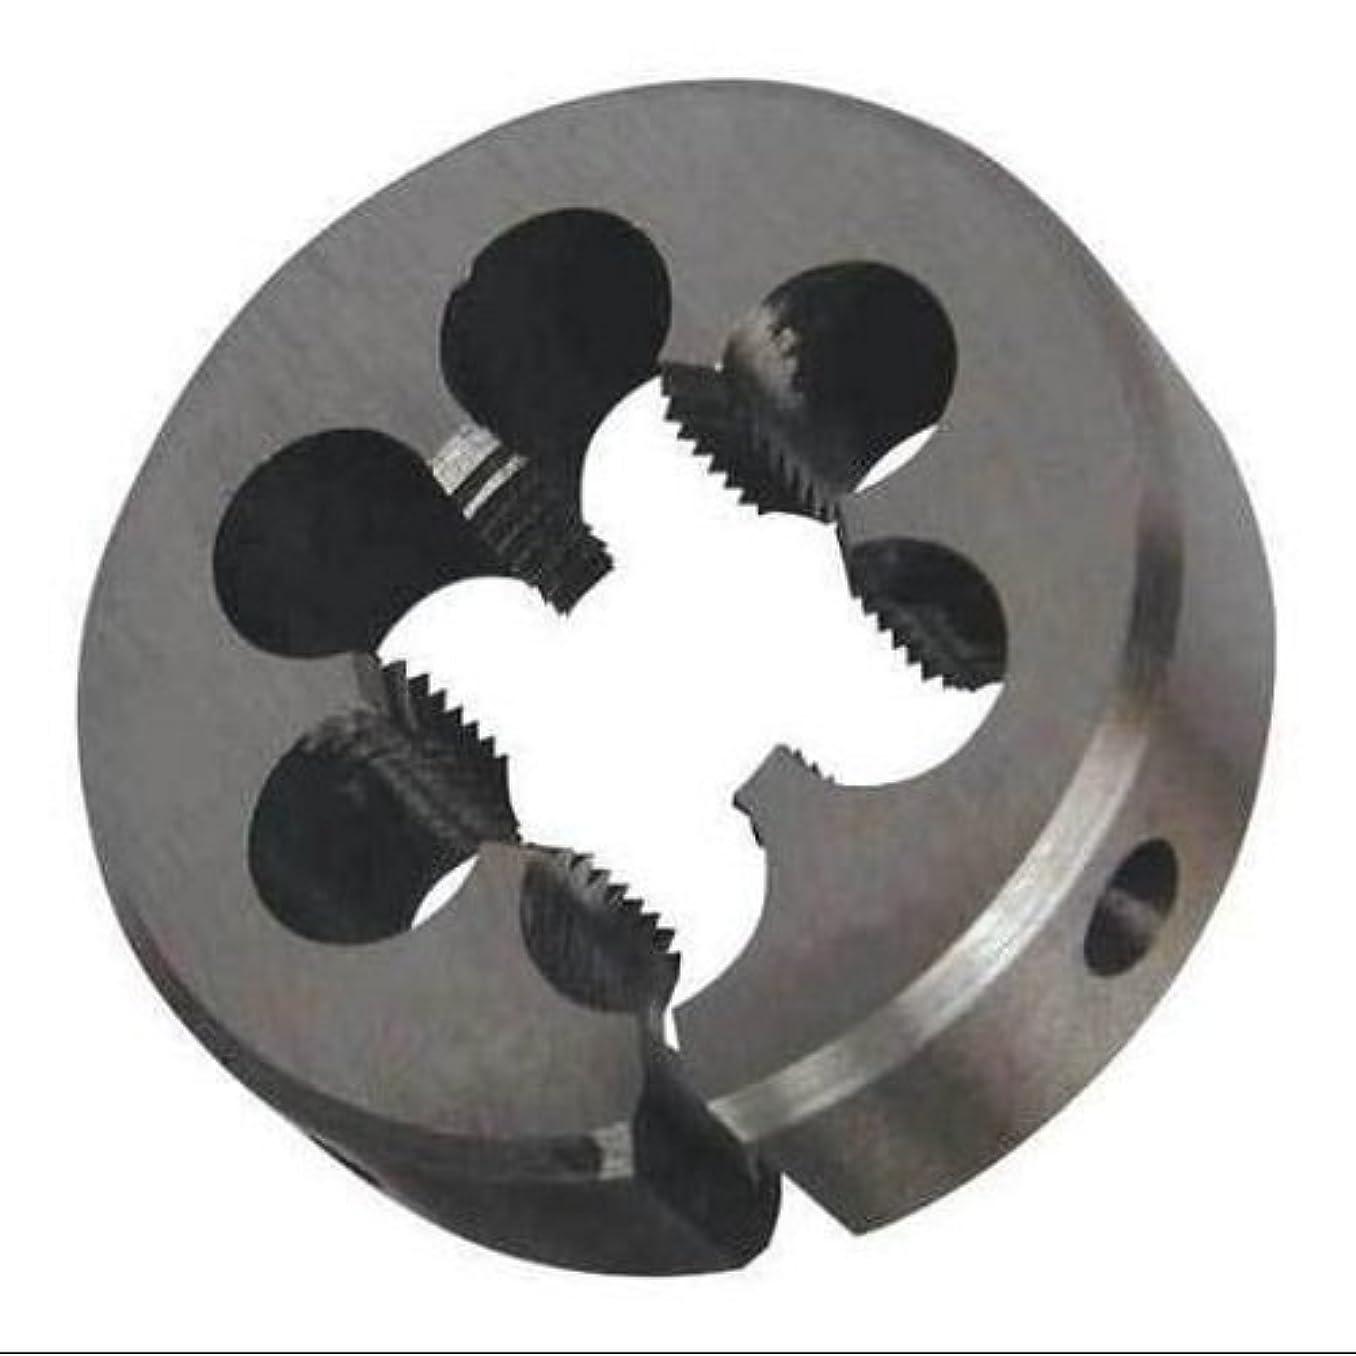 Alfa Tools HSRD90508 1-11-1/2 Npt Hss Round Adjustable Die 2-1/2 O.D,